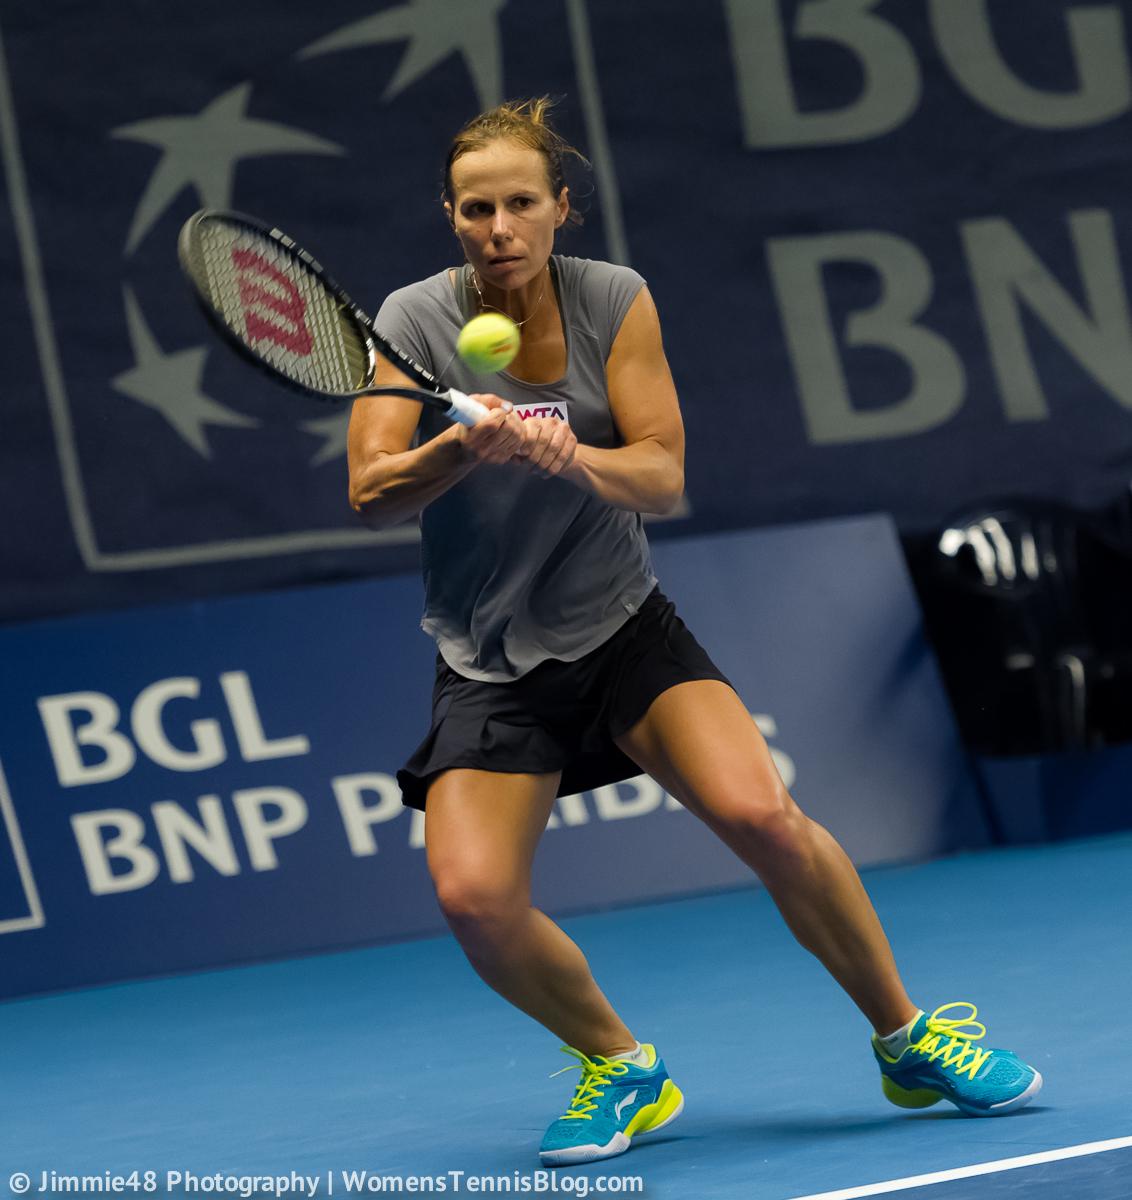 Semifinals Set in Luxembourg – Highlights | Women's Tennis ...Varvara Lepchenko Matches